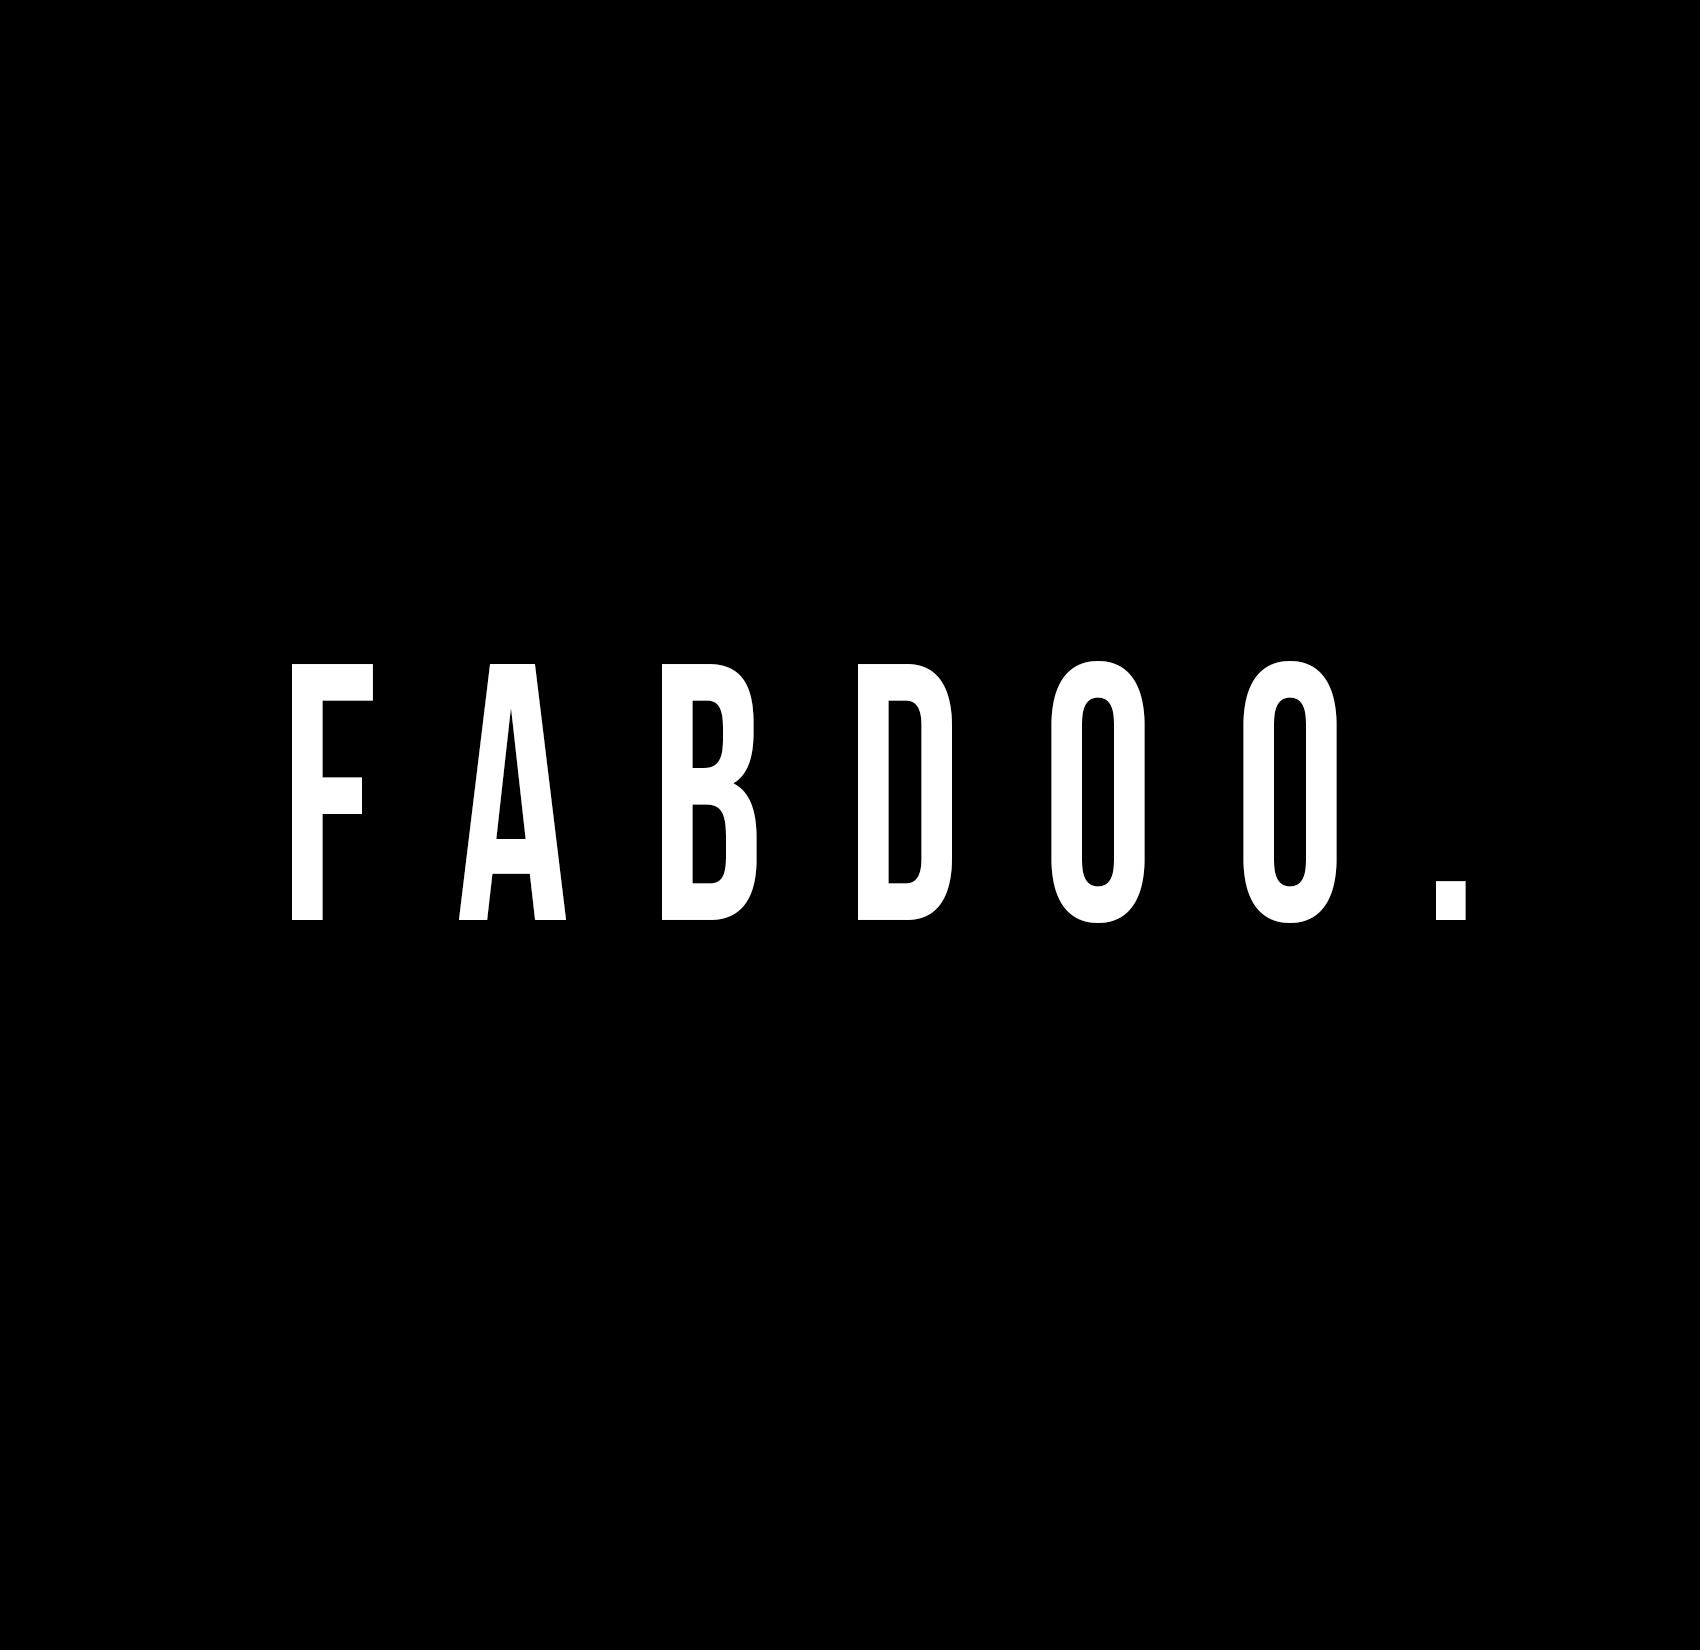 Fabdoo.